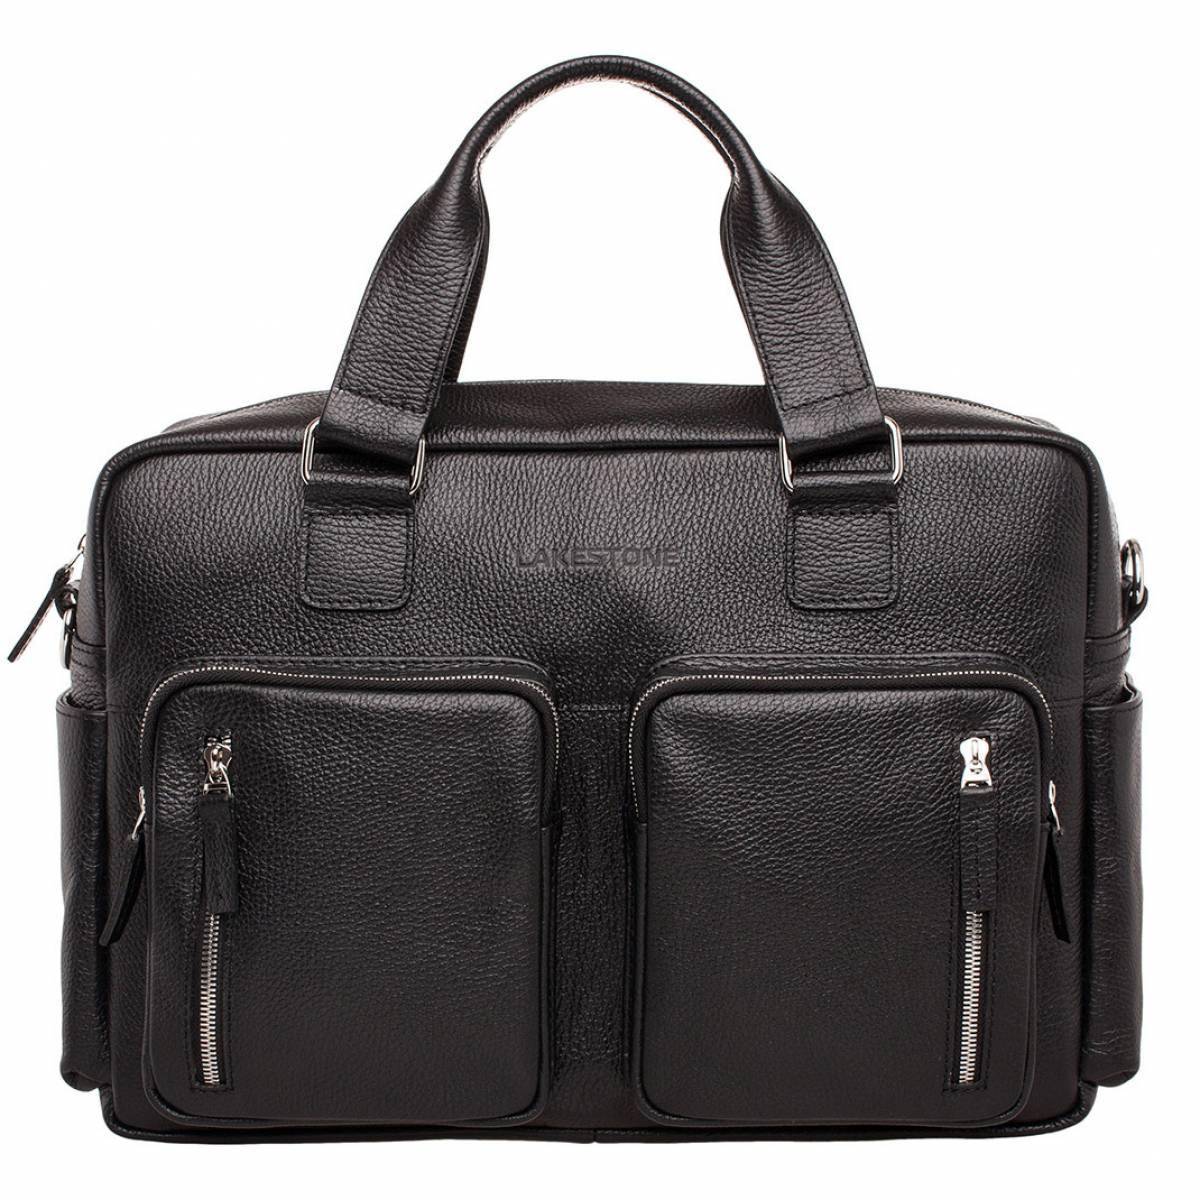 Деловая сумка большого объема Kingston Black